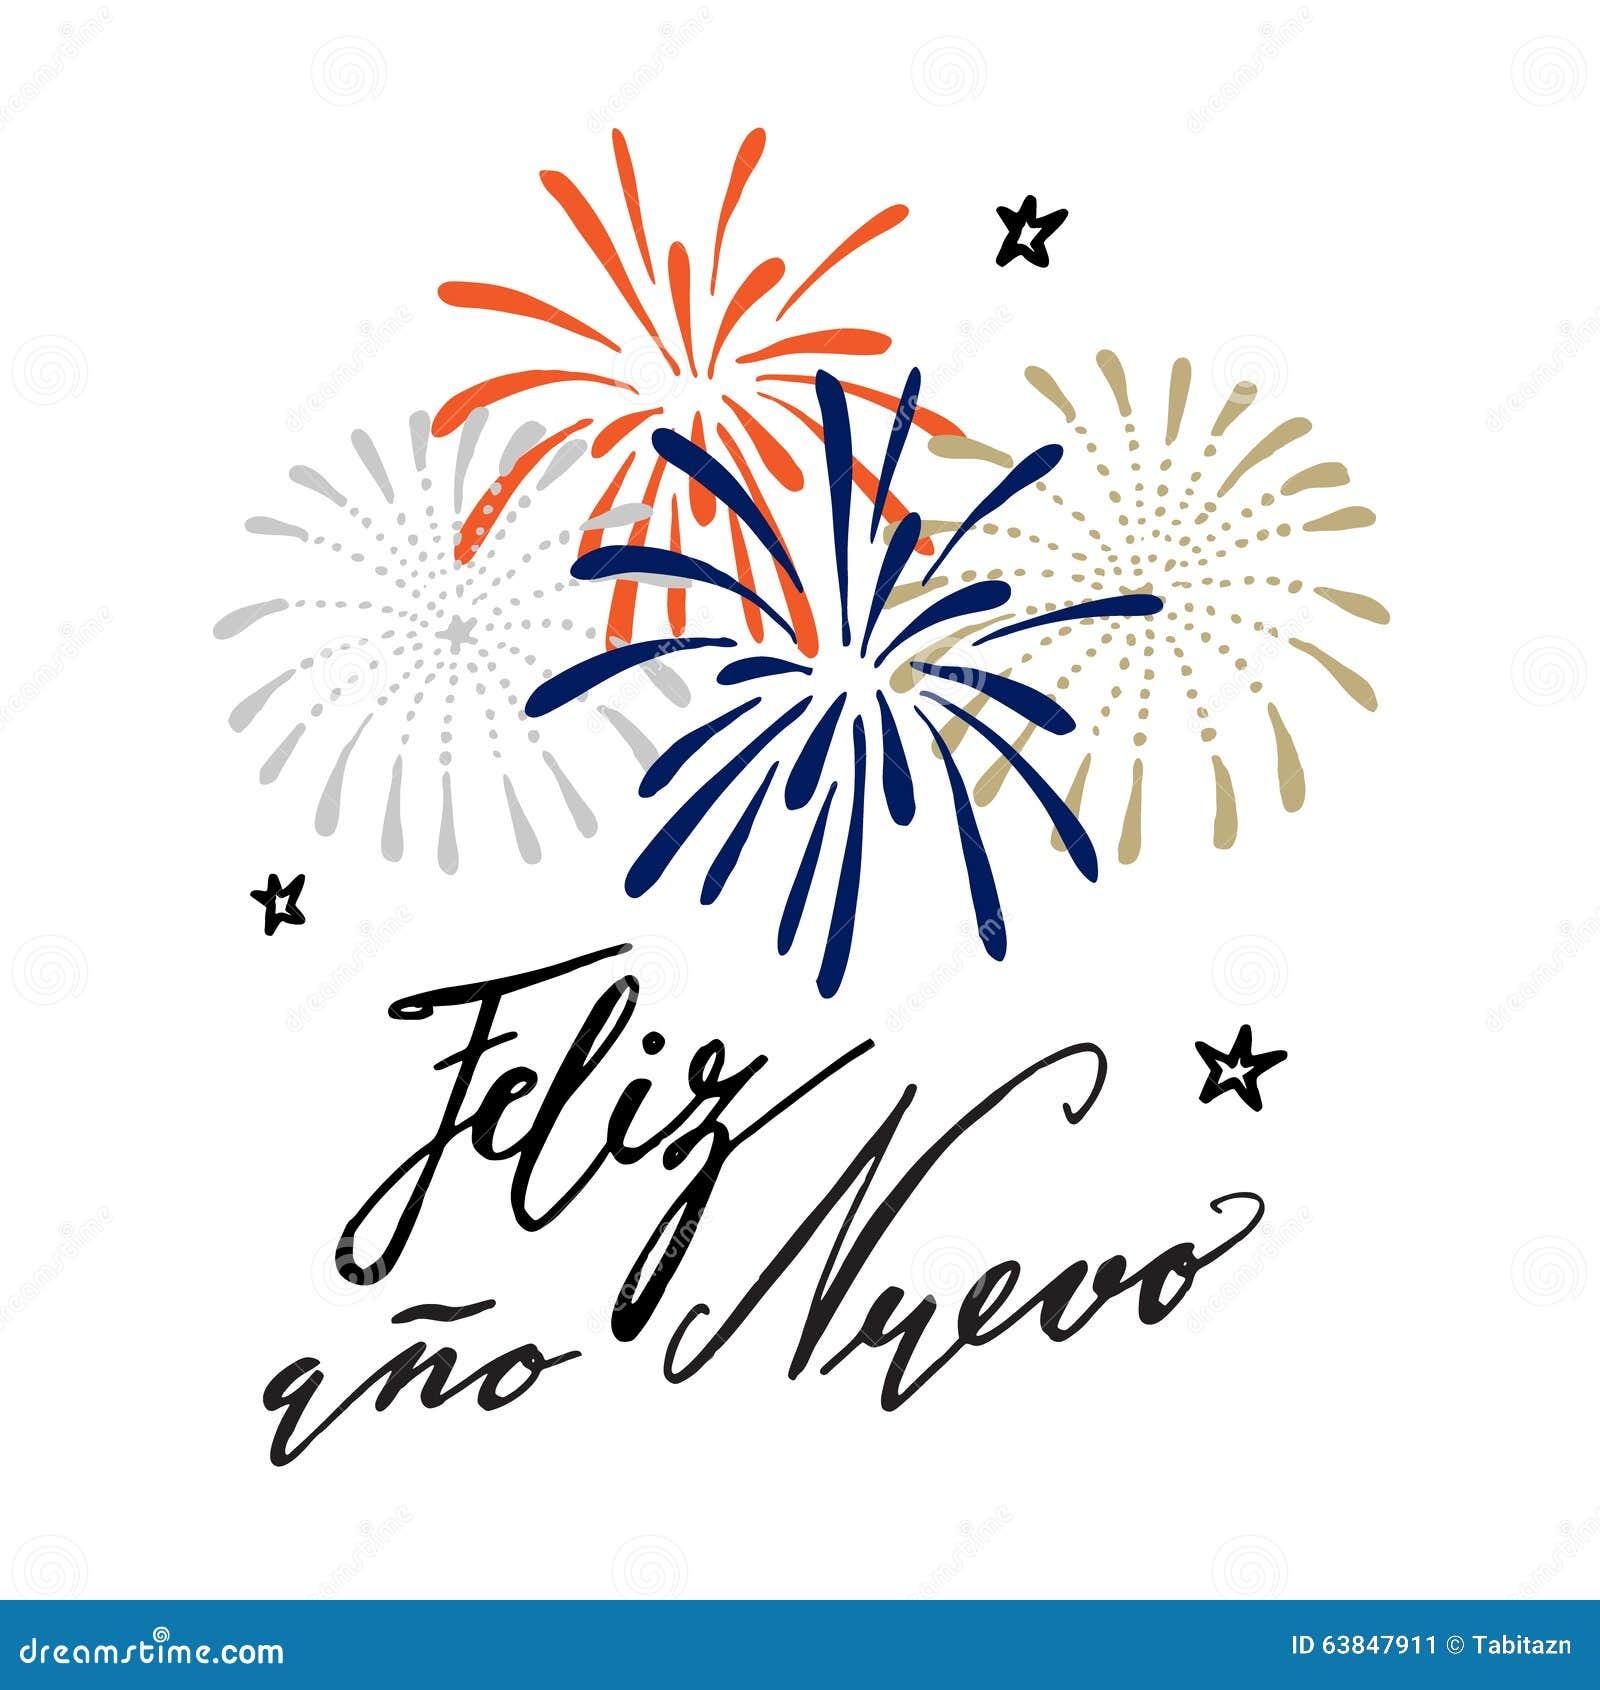 Feliz ano nuevo spanish happy new year greeting card stock vector feliz ano nuevo spanish happy new year greeting card m4hsunfo Choice Image